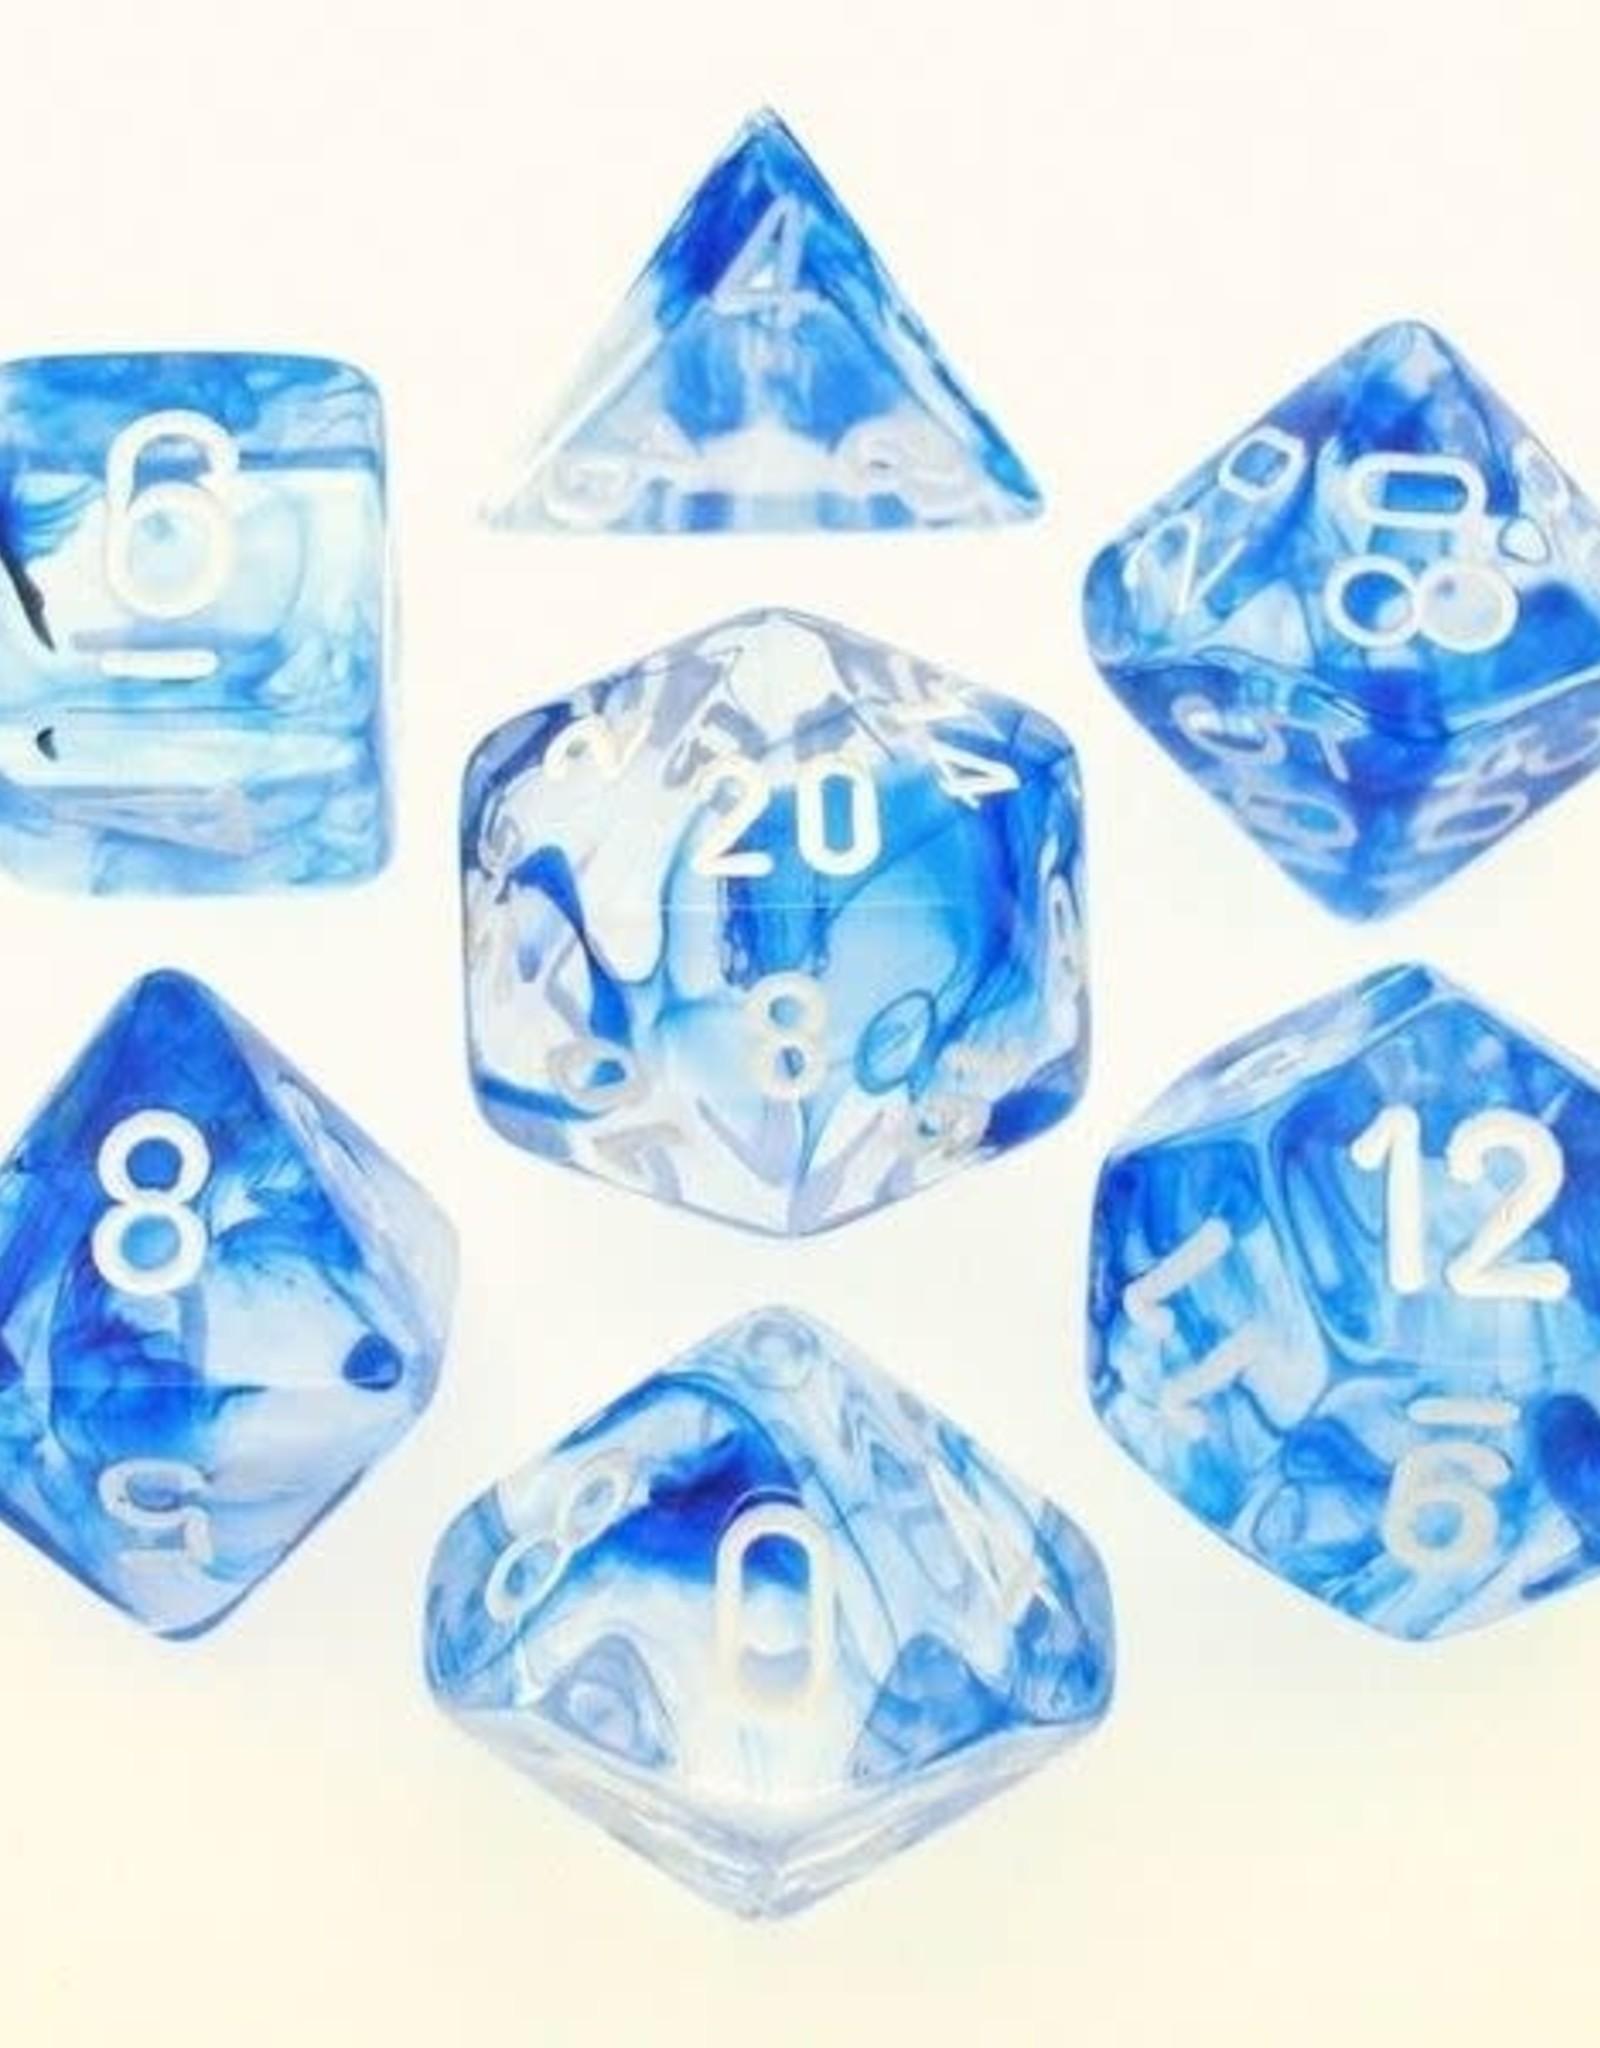 Chessex Poly Dice Set Nebula Dark Blue w/ White